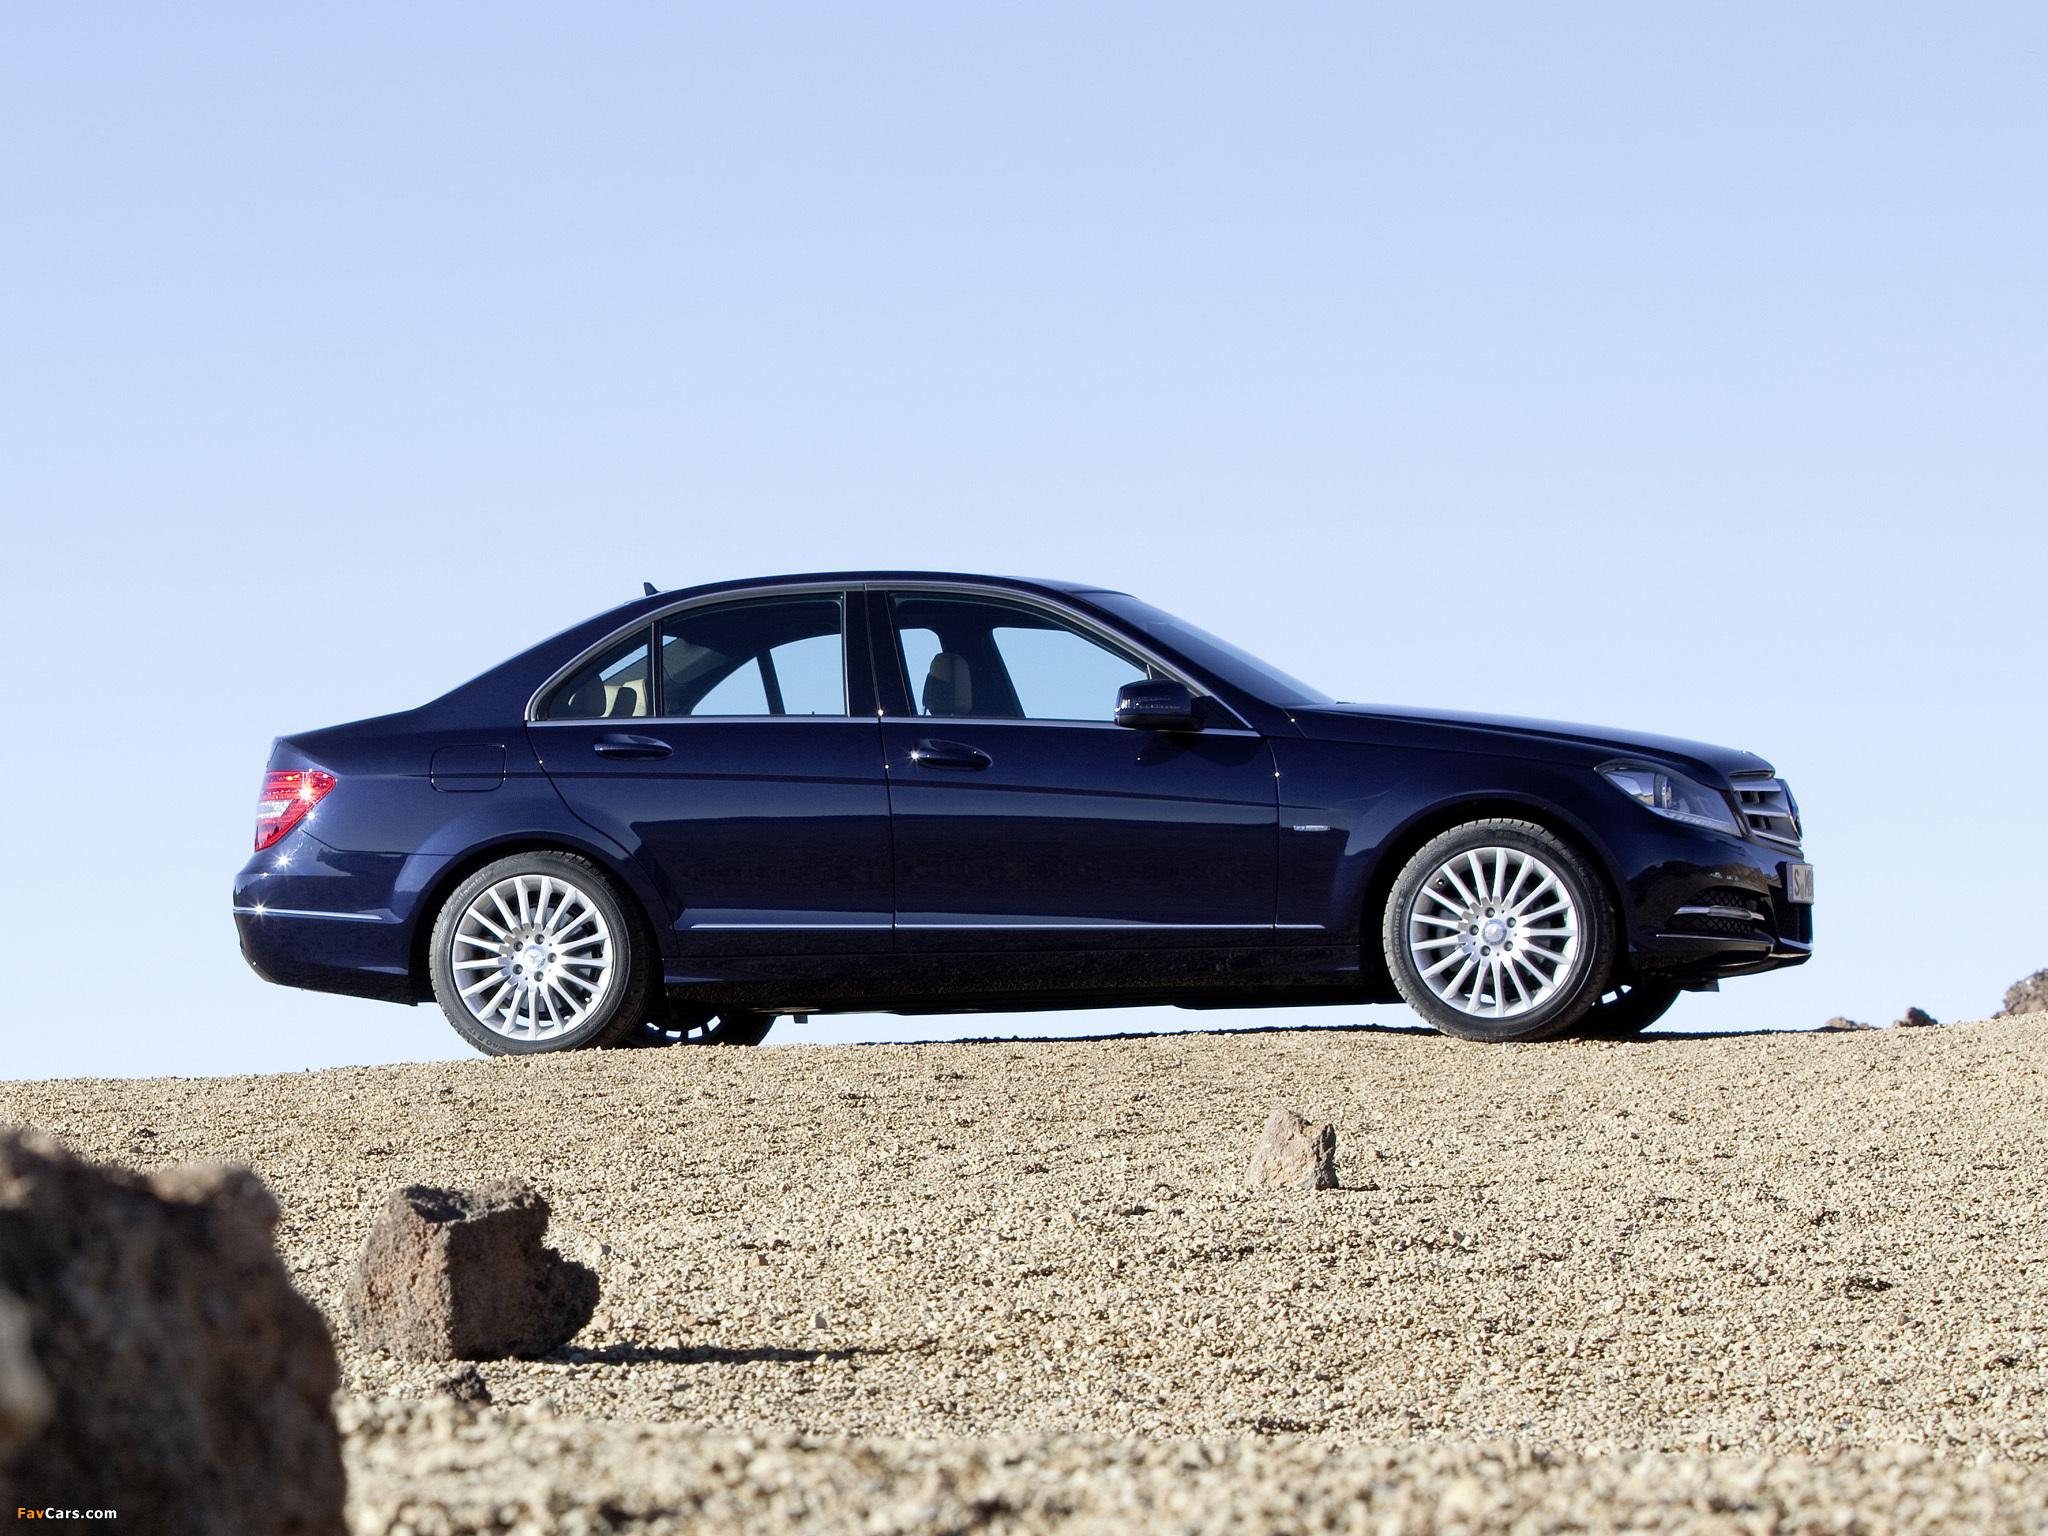 Mercedes-Benz C 250 CDI BlueEfficiency (W204) 2011 pictures (2048 x 1536)